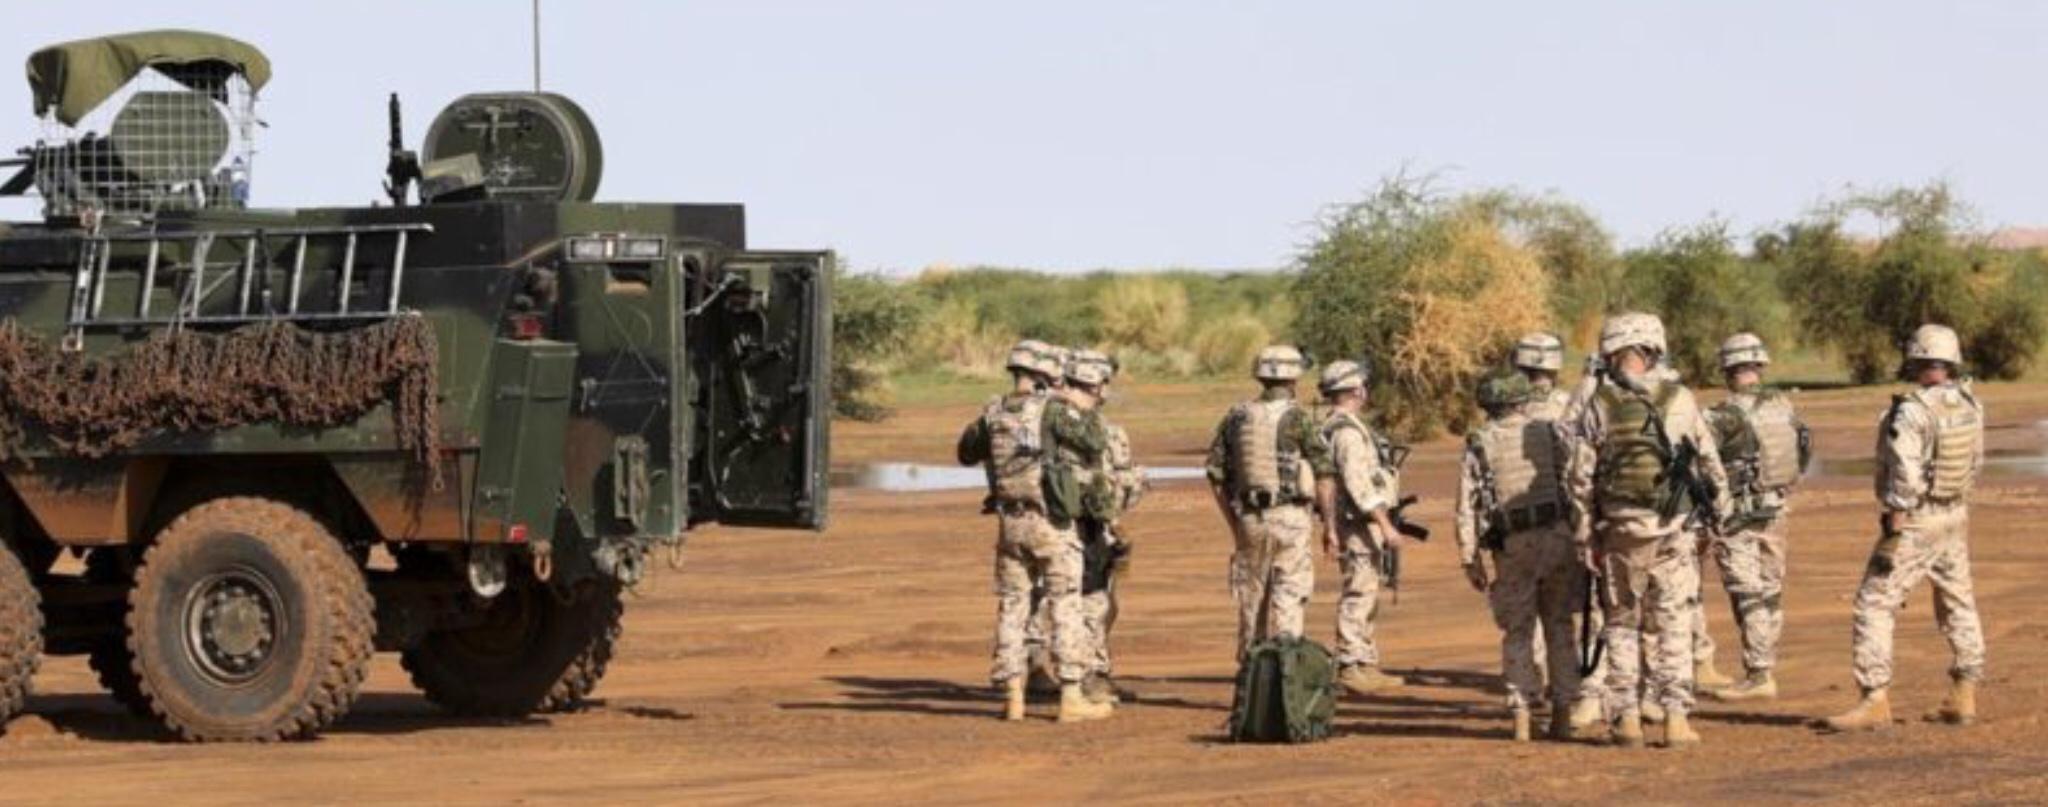 Mali: france ends Barkhane operation